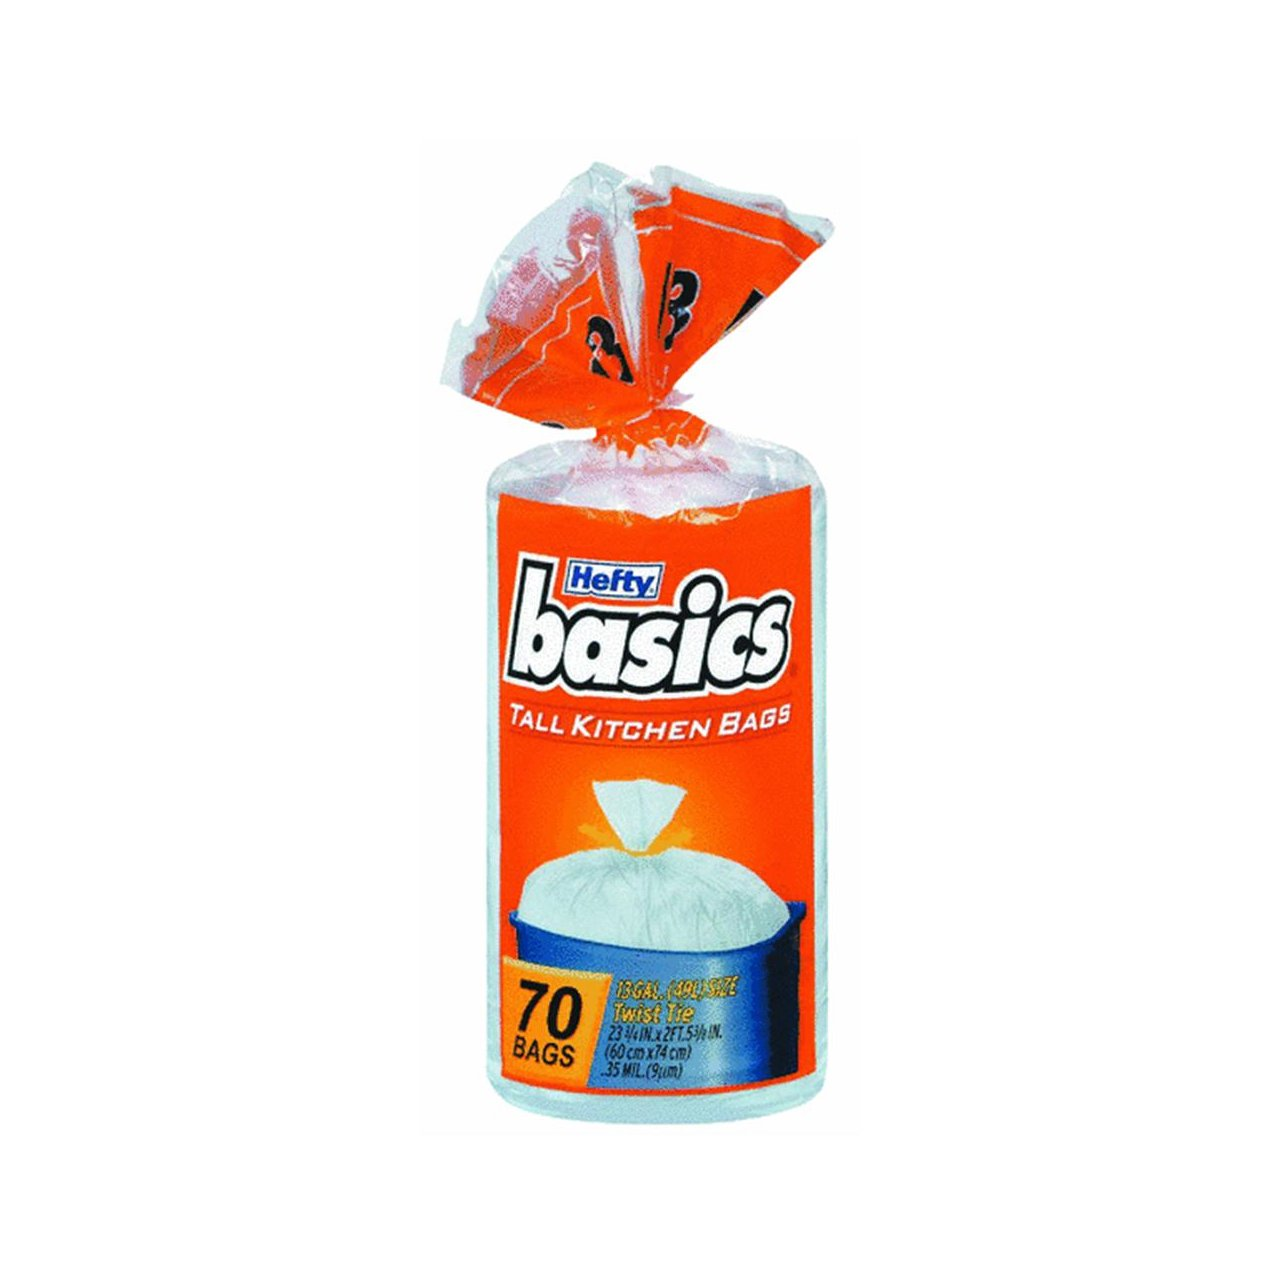 Amazon.com: Hefty E50370 13 Gallon Basics Tall Kitchen Bags 70 Count ...